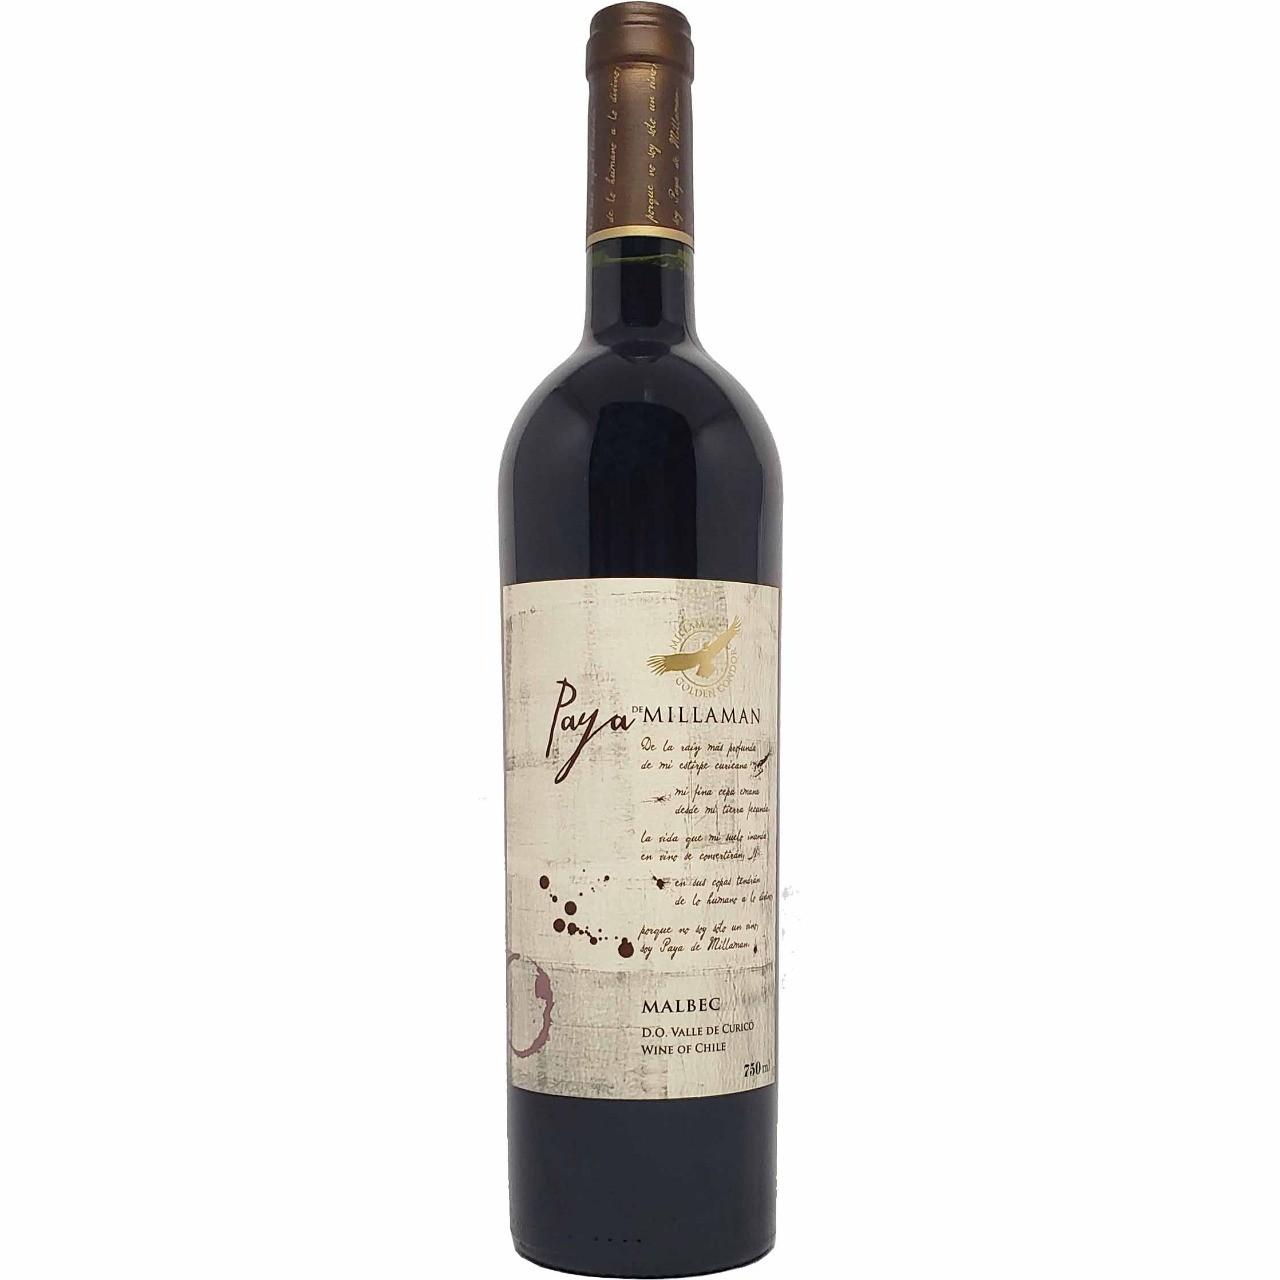 Vinho Tinto Paya Millaman Malbec - 750ml -